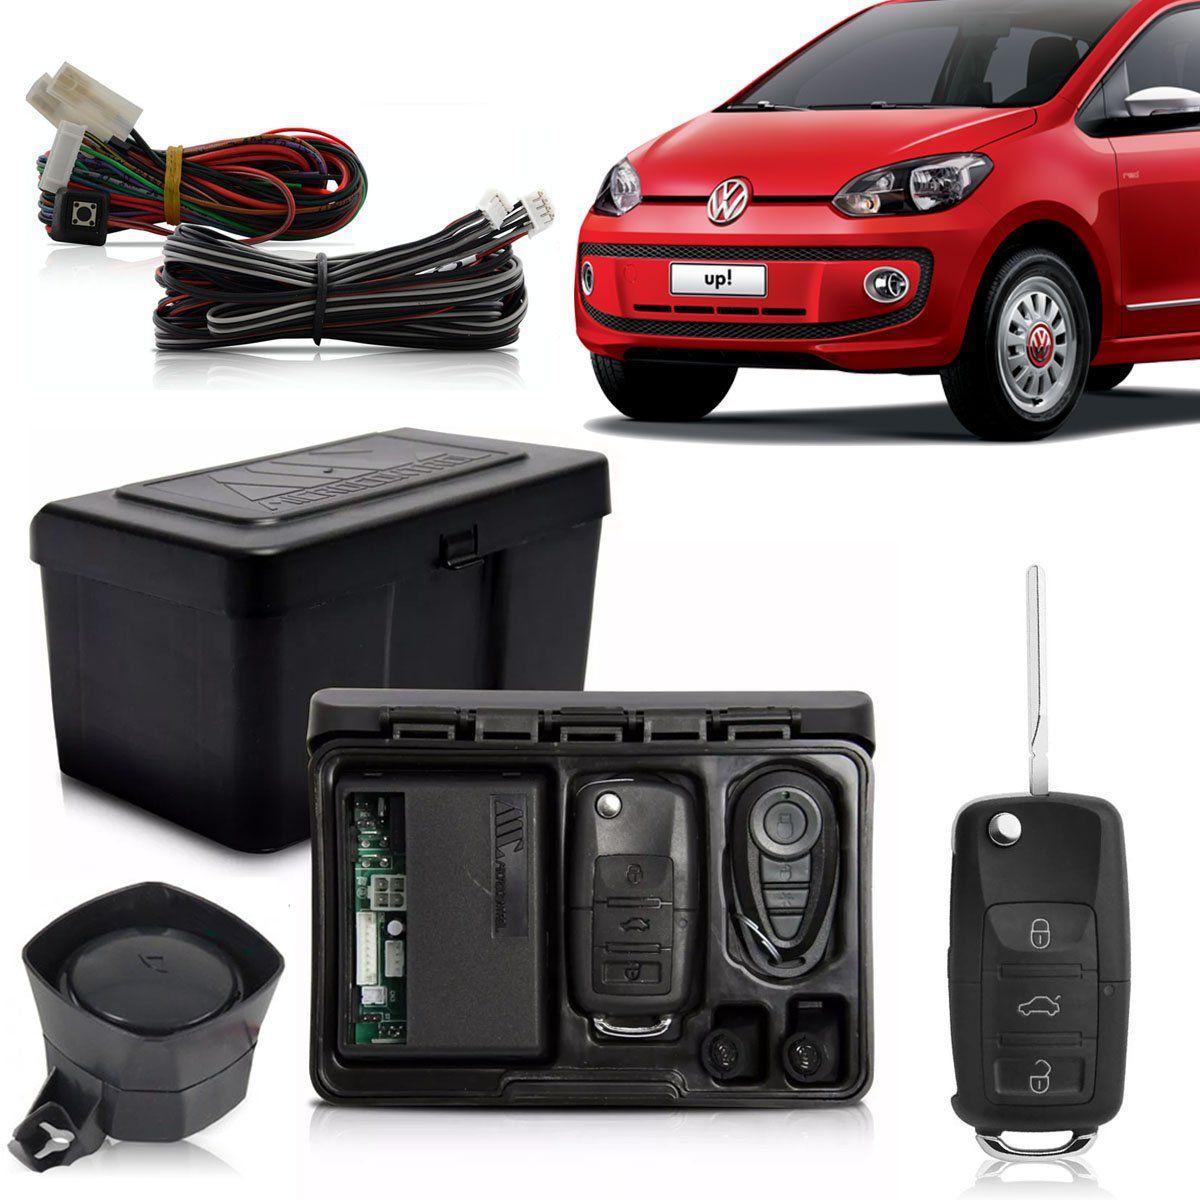 Alarme Automotivo Bloqueador Anti-furto Chave Canivete Up! 2011 Até 2019